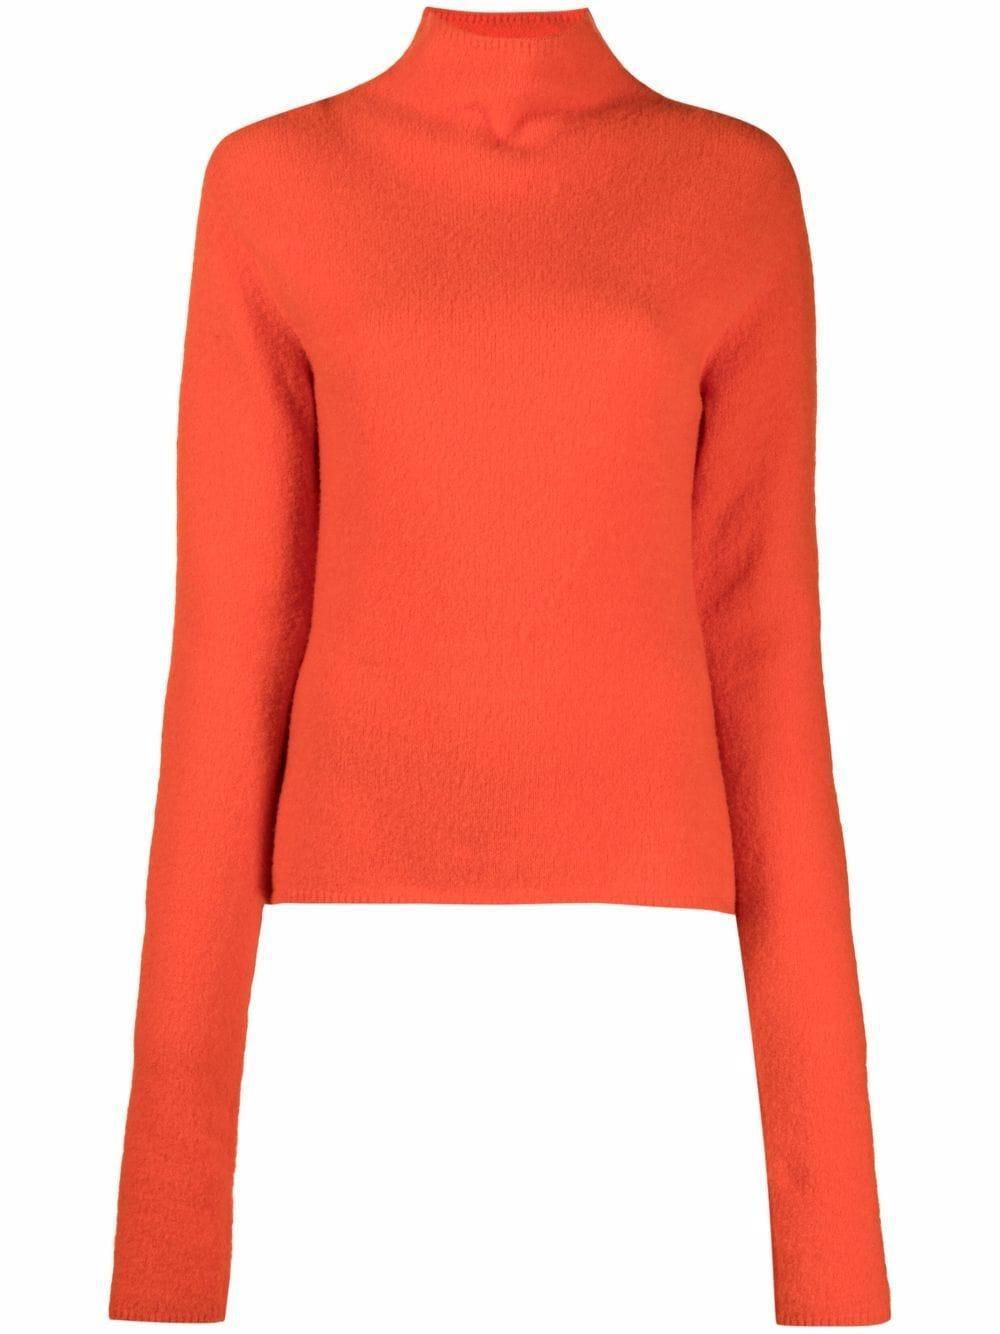 Liana Compact Bouclé Turtleneck Sweater Item # NW21FWTP00917